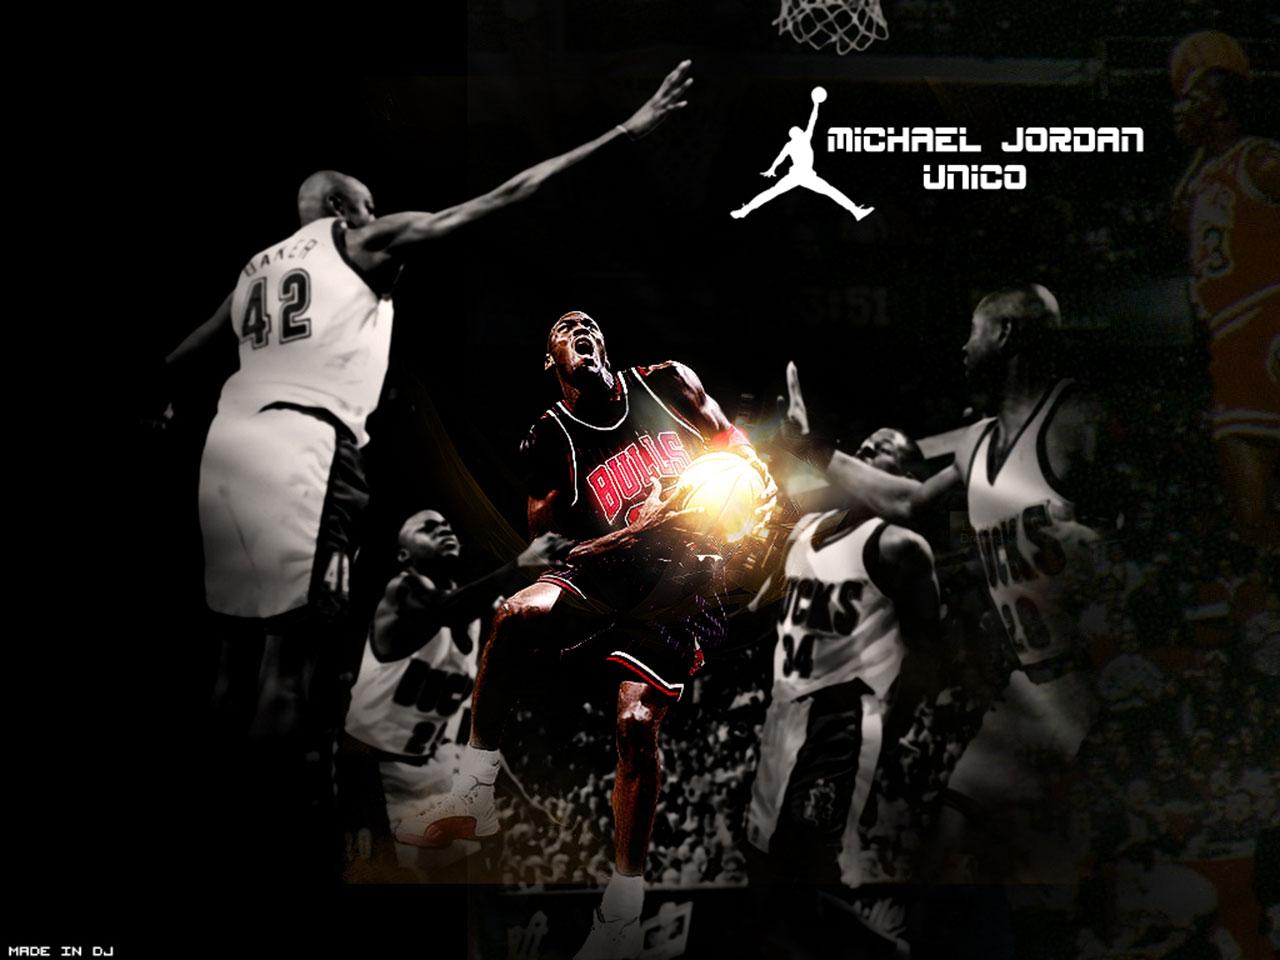 http://4.bp.blogspot.com/_FUqunw1CcGY/TQ5PE4aYvNI/AAAAAAAAAgk/U7I6UOMEuqk/s1600/Michael-Jordan-Wallpaper-001.jpg